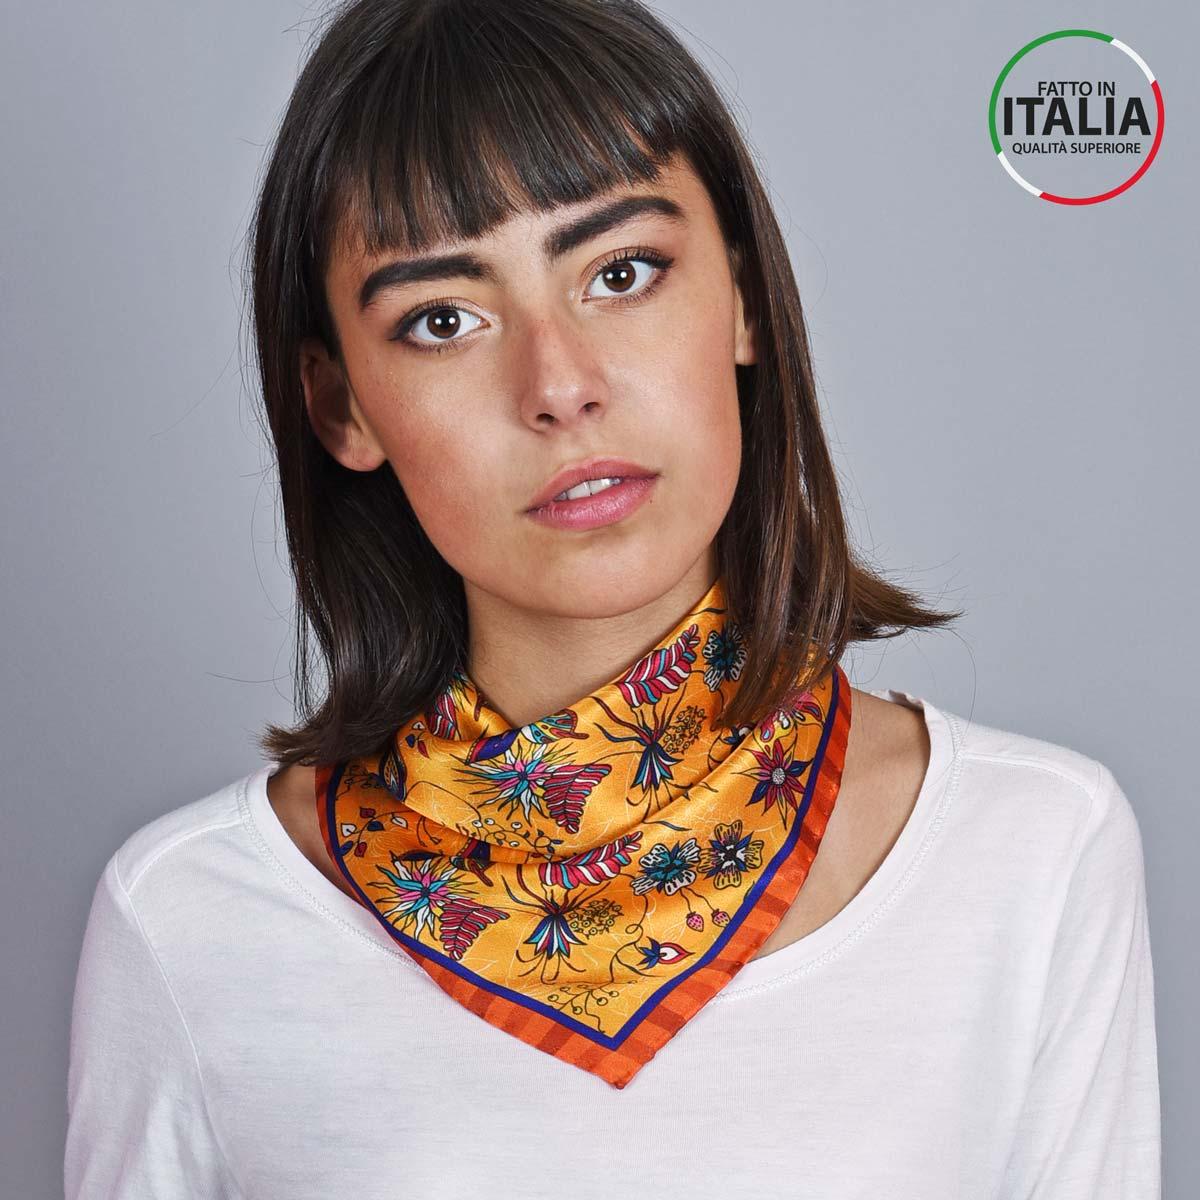 AT-05393_W12-1IT_Petit-foulard-carre-soie-jaune-orange-made-in-italie